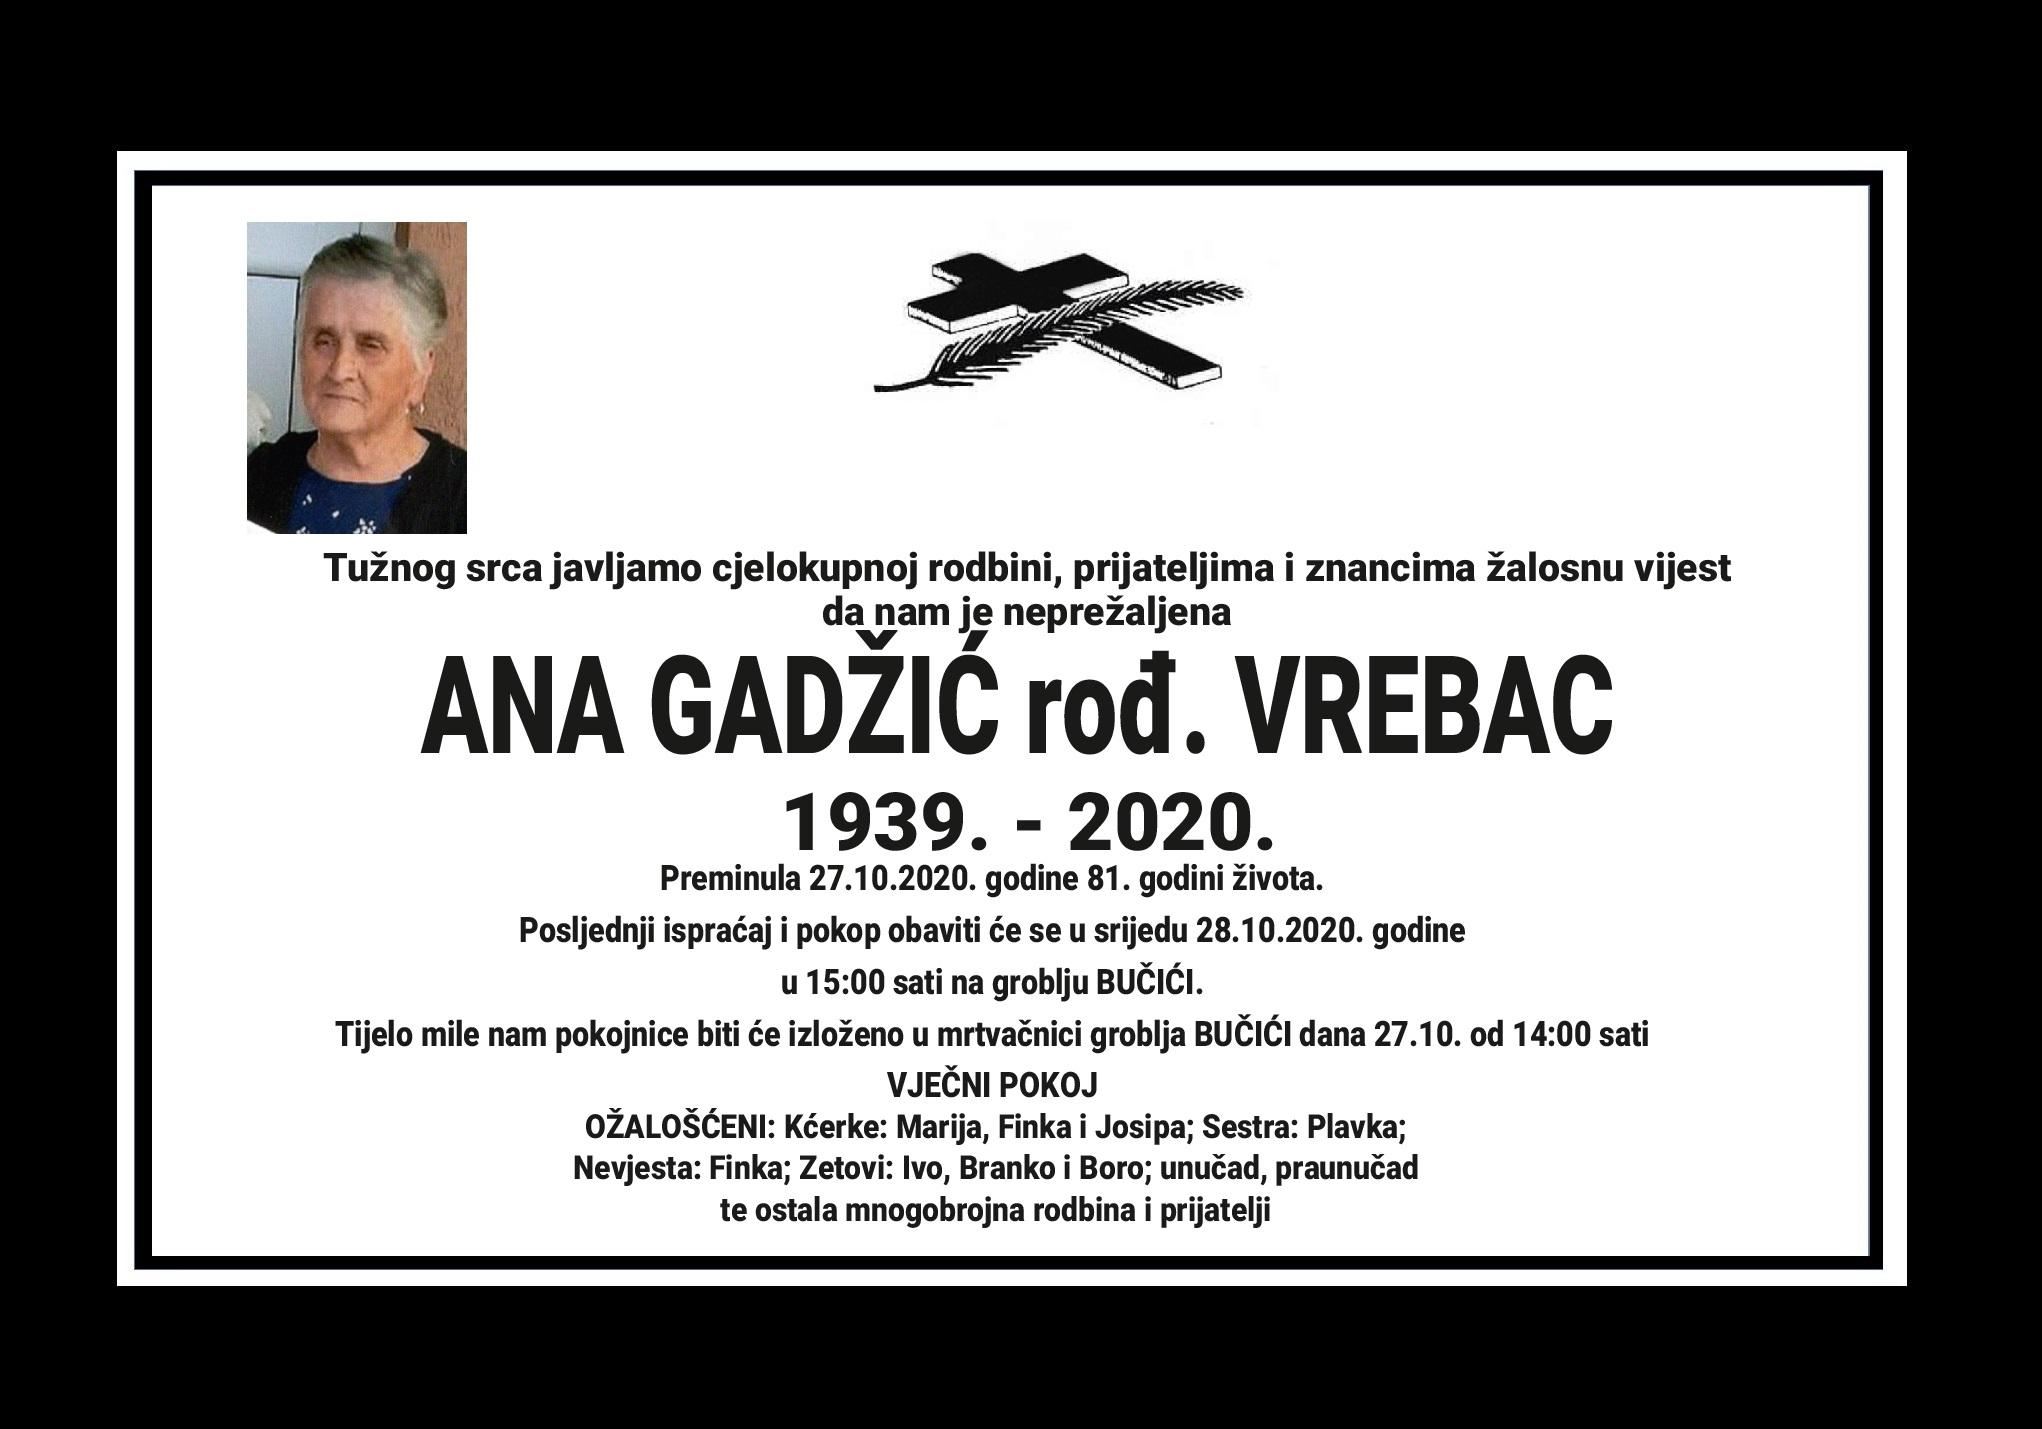 Ana Gadžić rođ. Vrebac